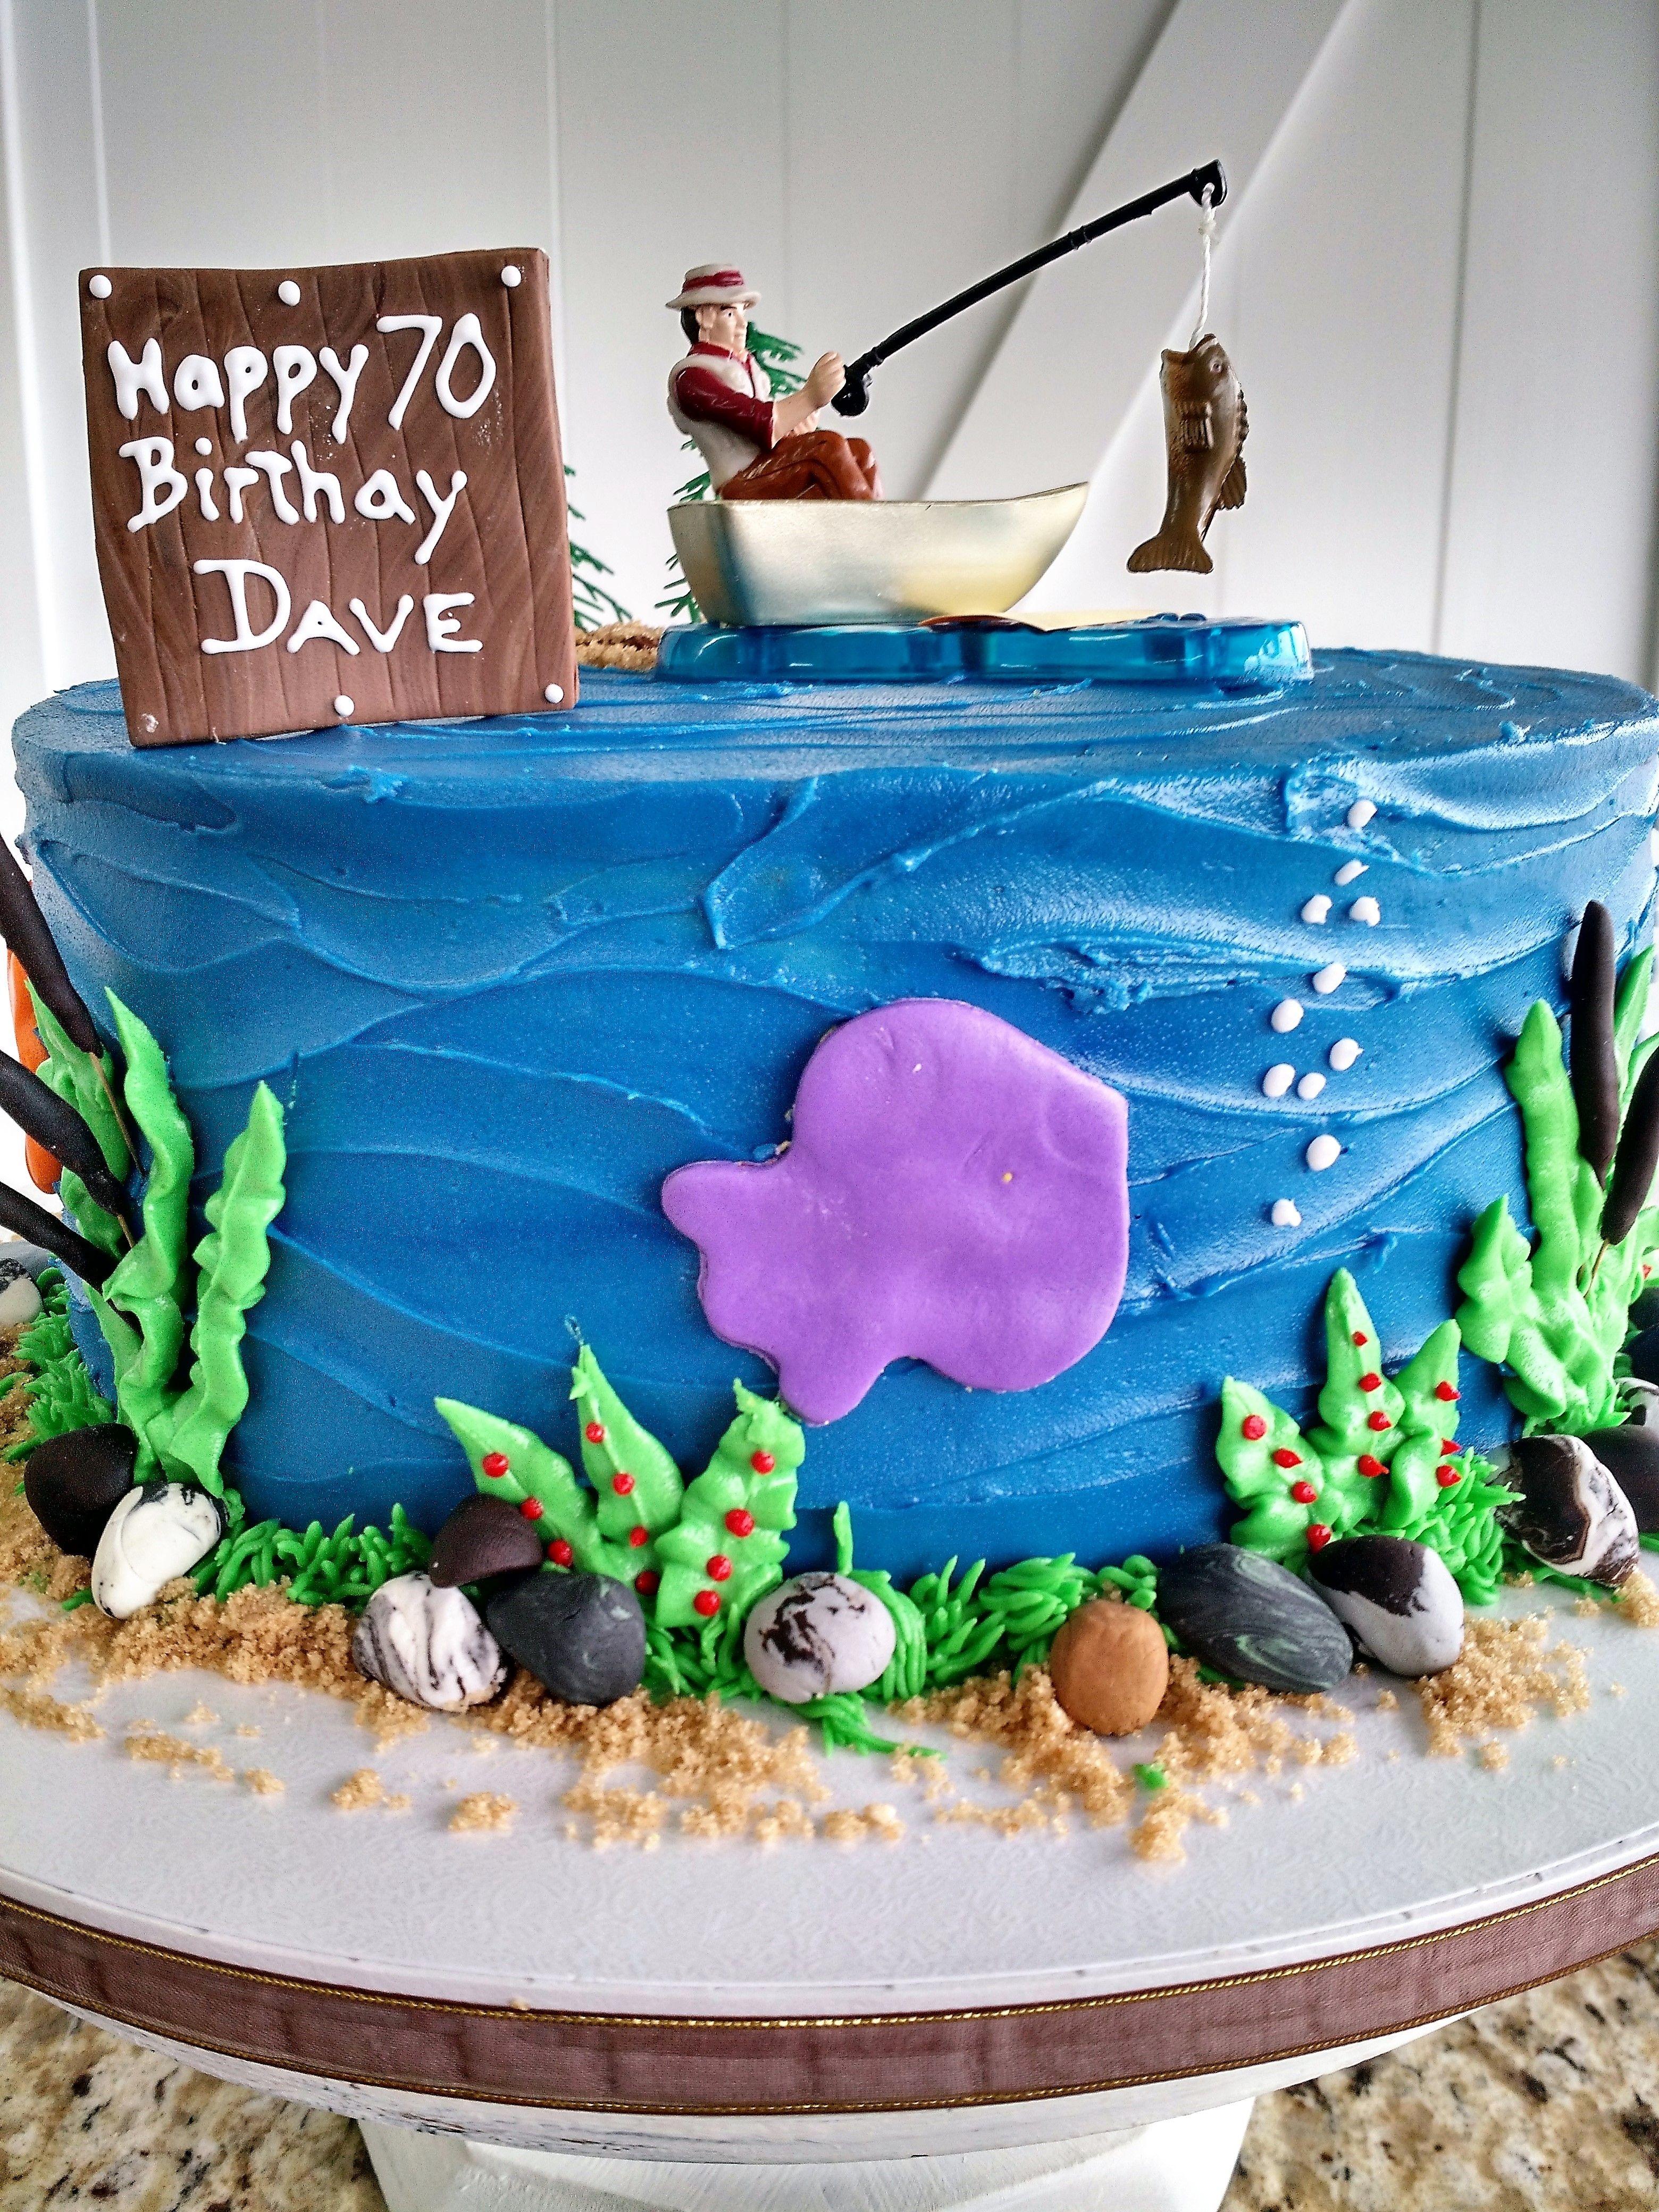 Custom Gone Fishing Birthday Cake Made By Chef Aura Fuenmayor